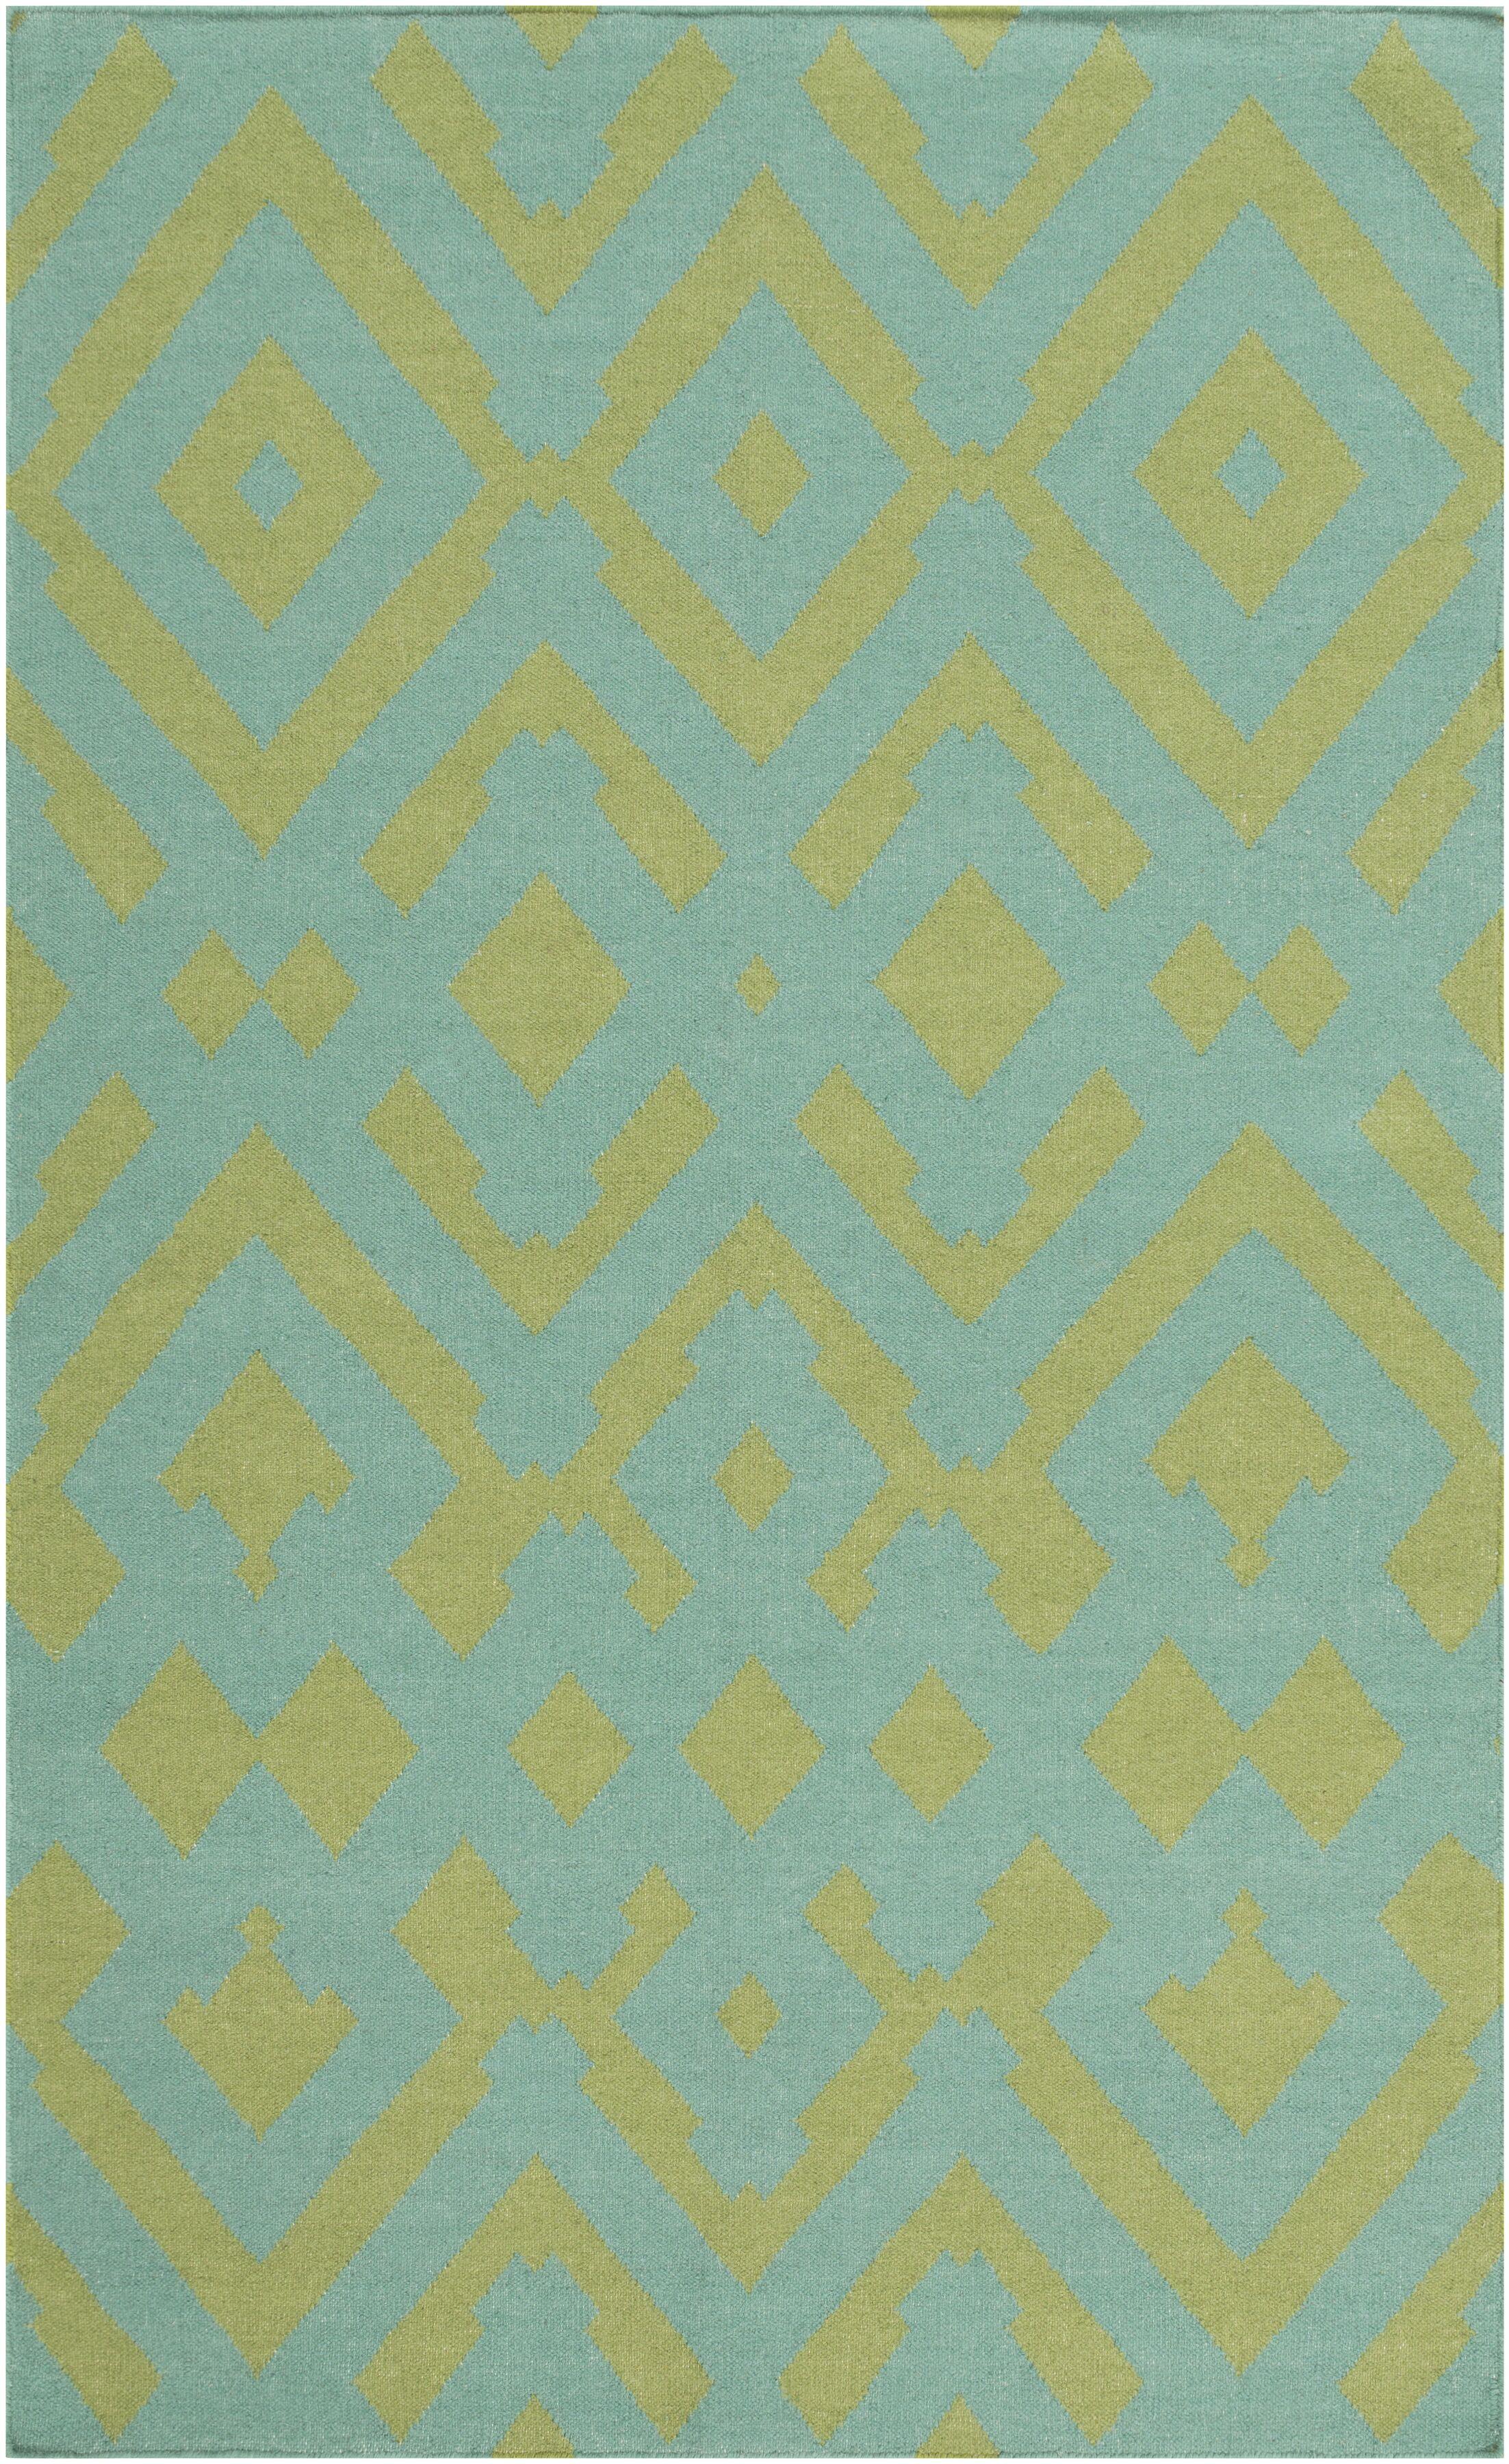 Hemel Teal/Moss Geometric Area Rug Rug Size: Rectangle 5' x 8'